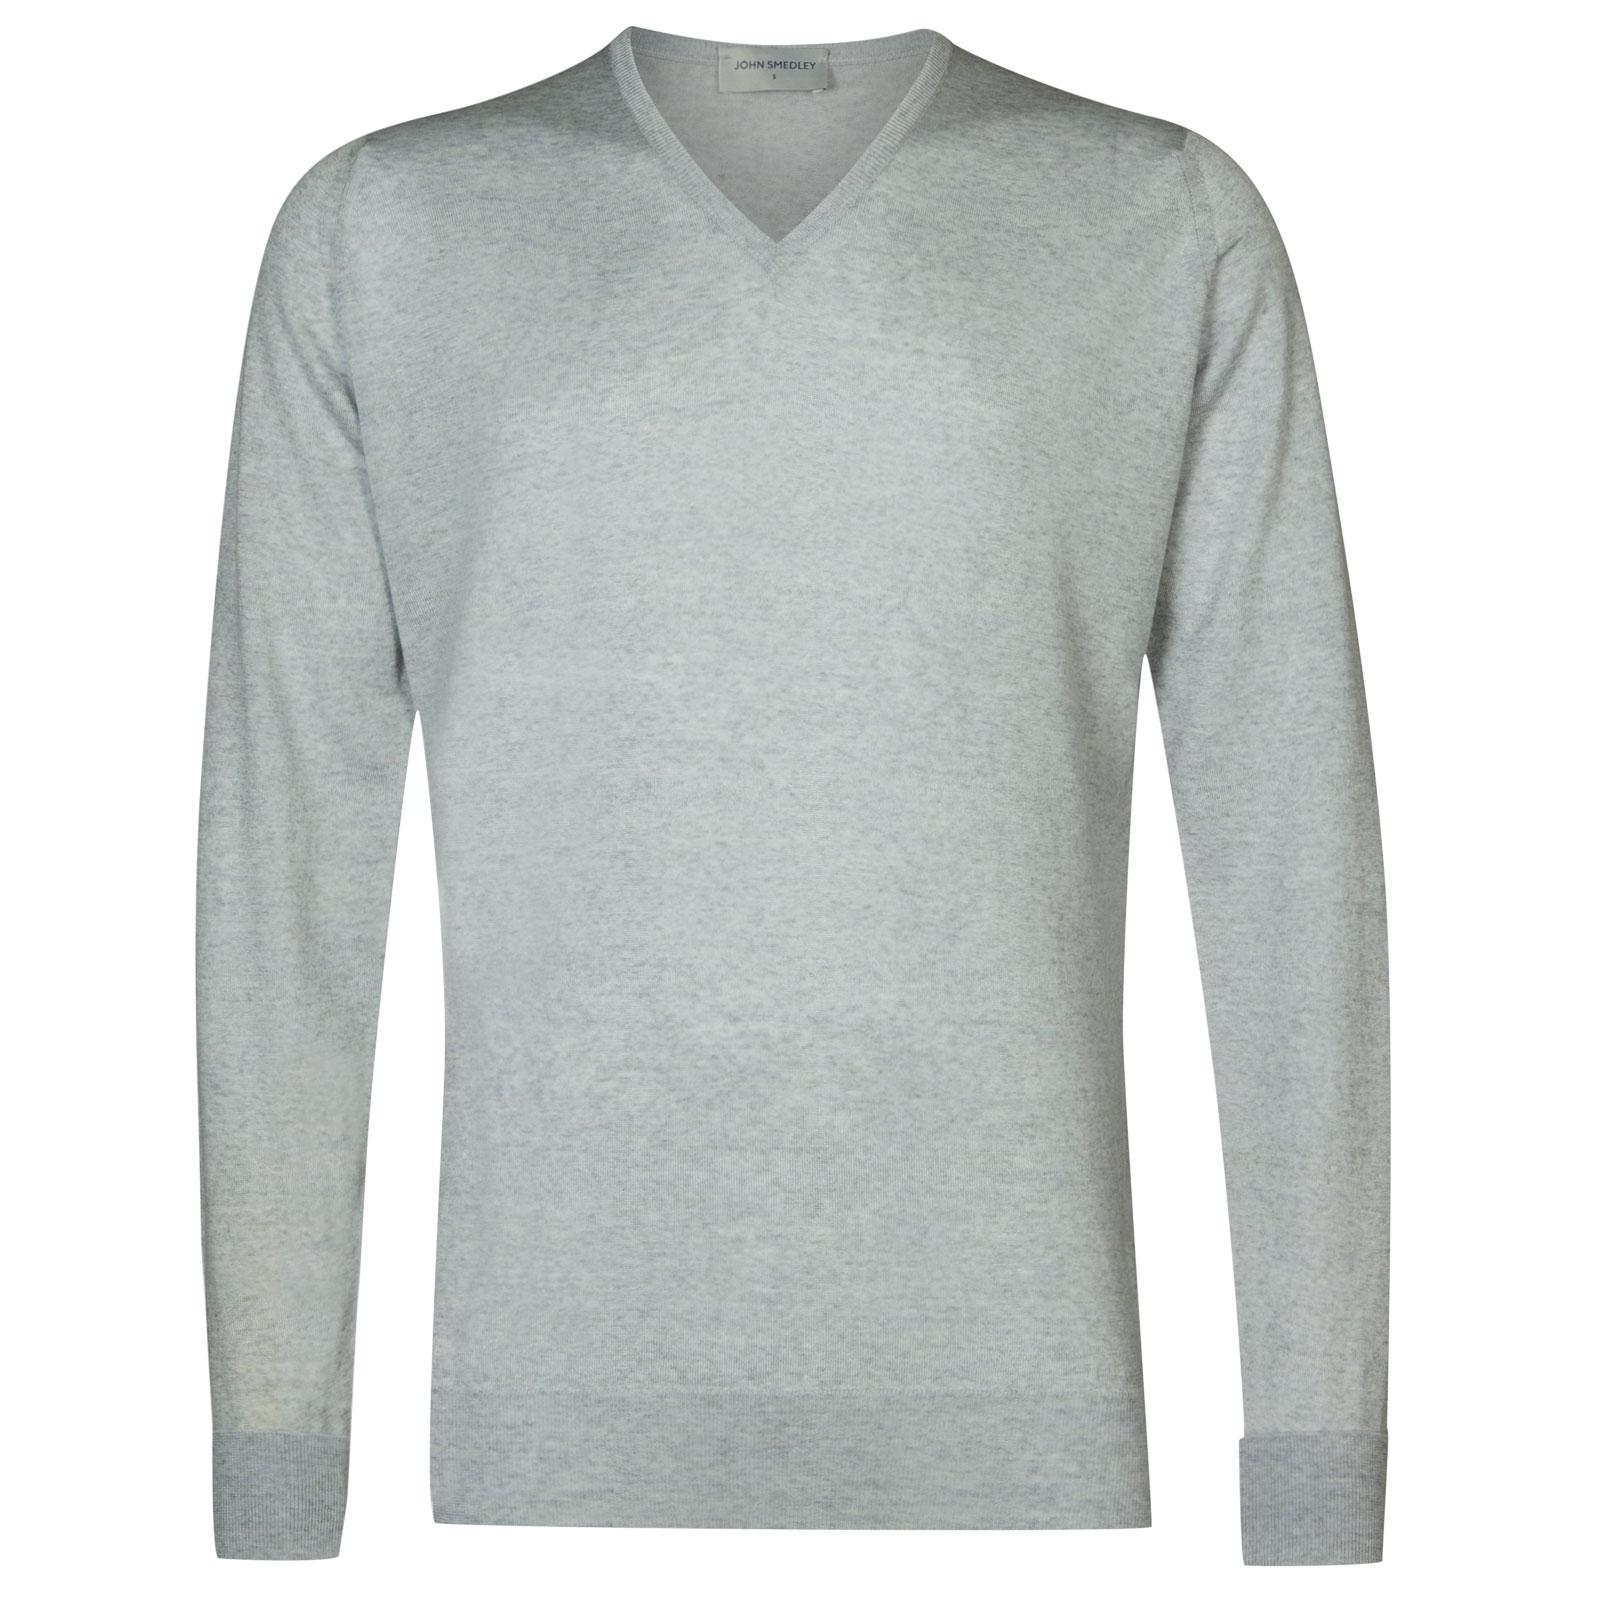 John Smedley bobby Merino Wool Pullover in Bardot Grey-L